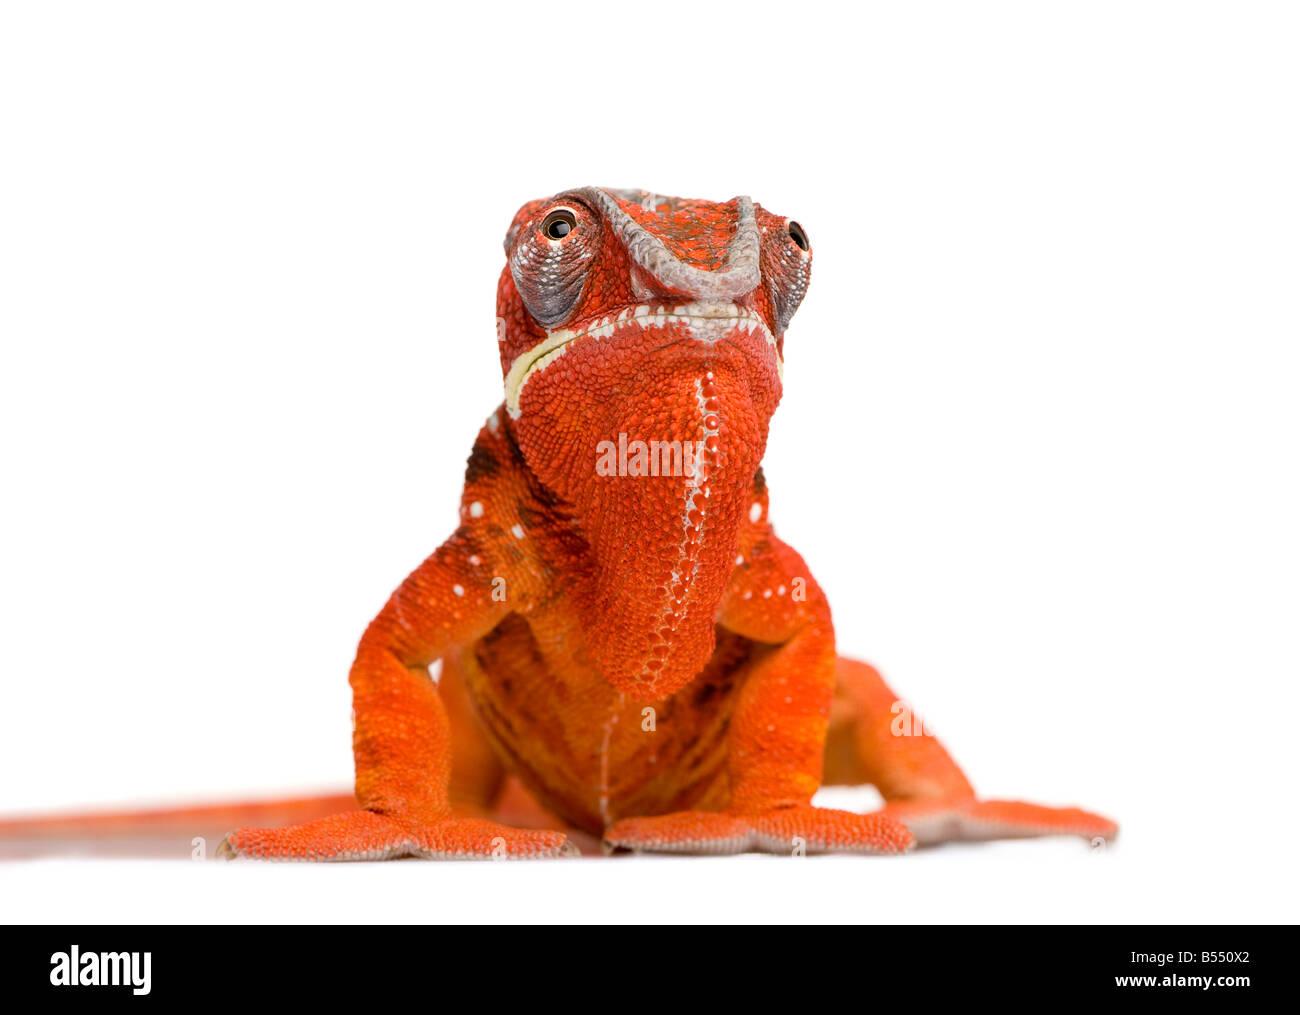 Chameleon Furcifer Pardalis Sambava 2 years in front of a white background - Stock Image